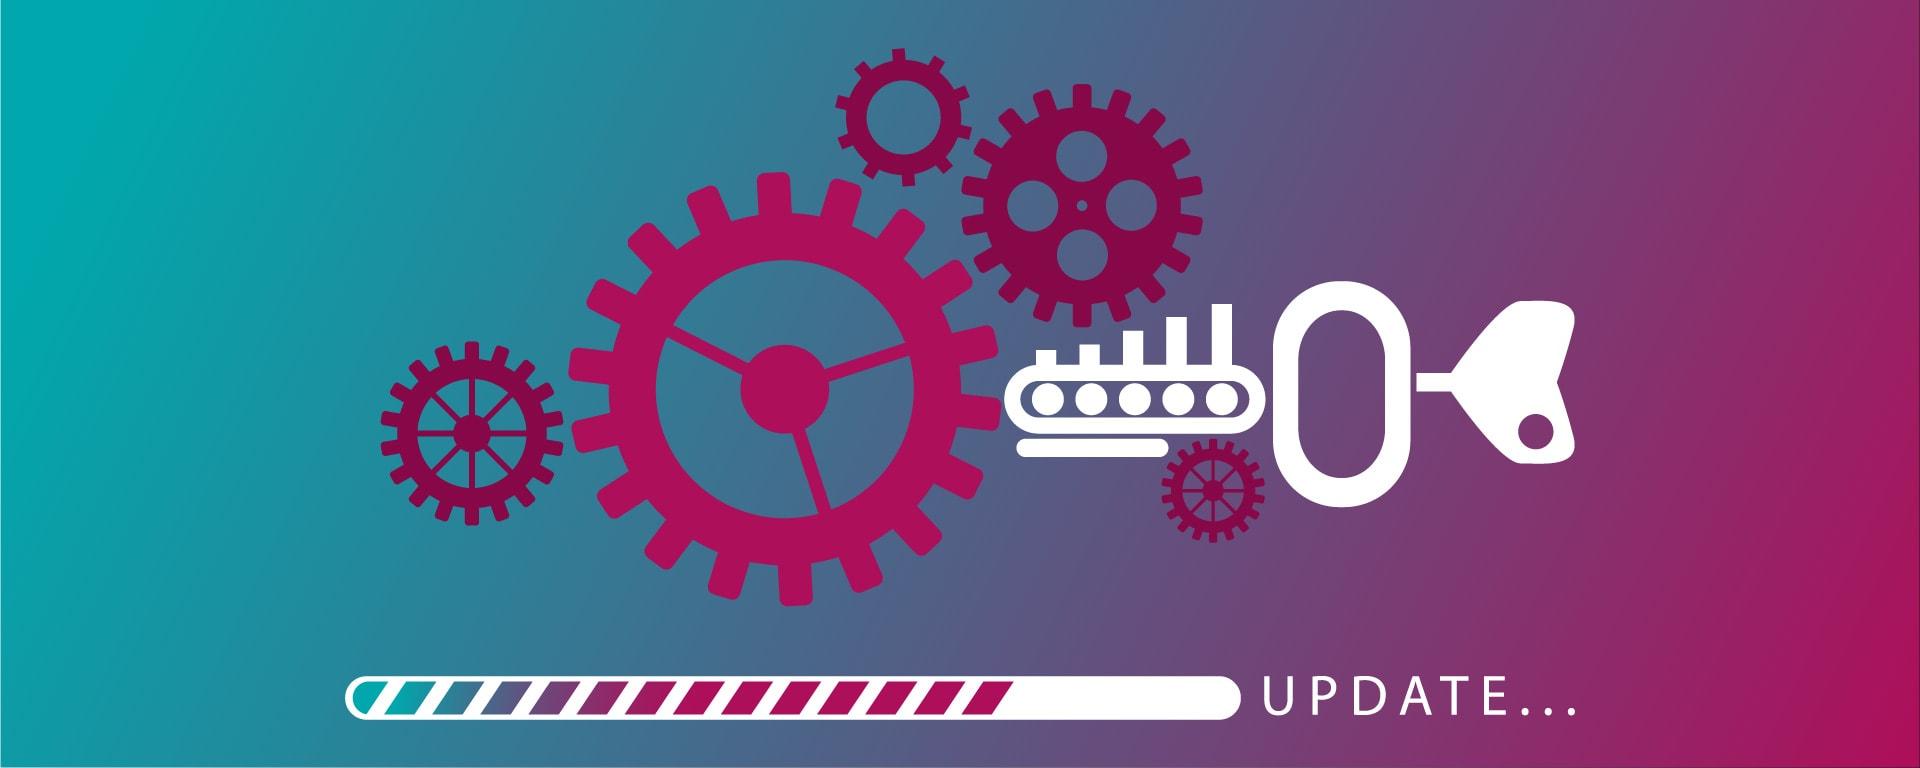 Signavio product update solman header image